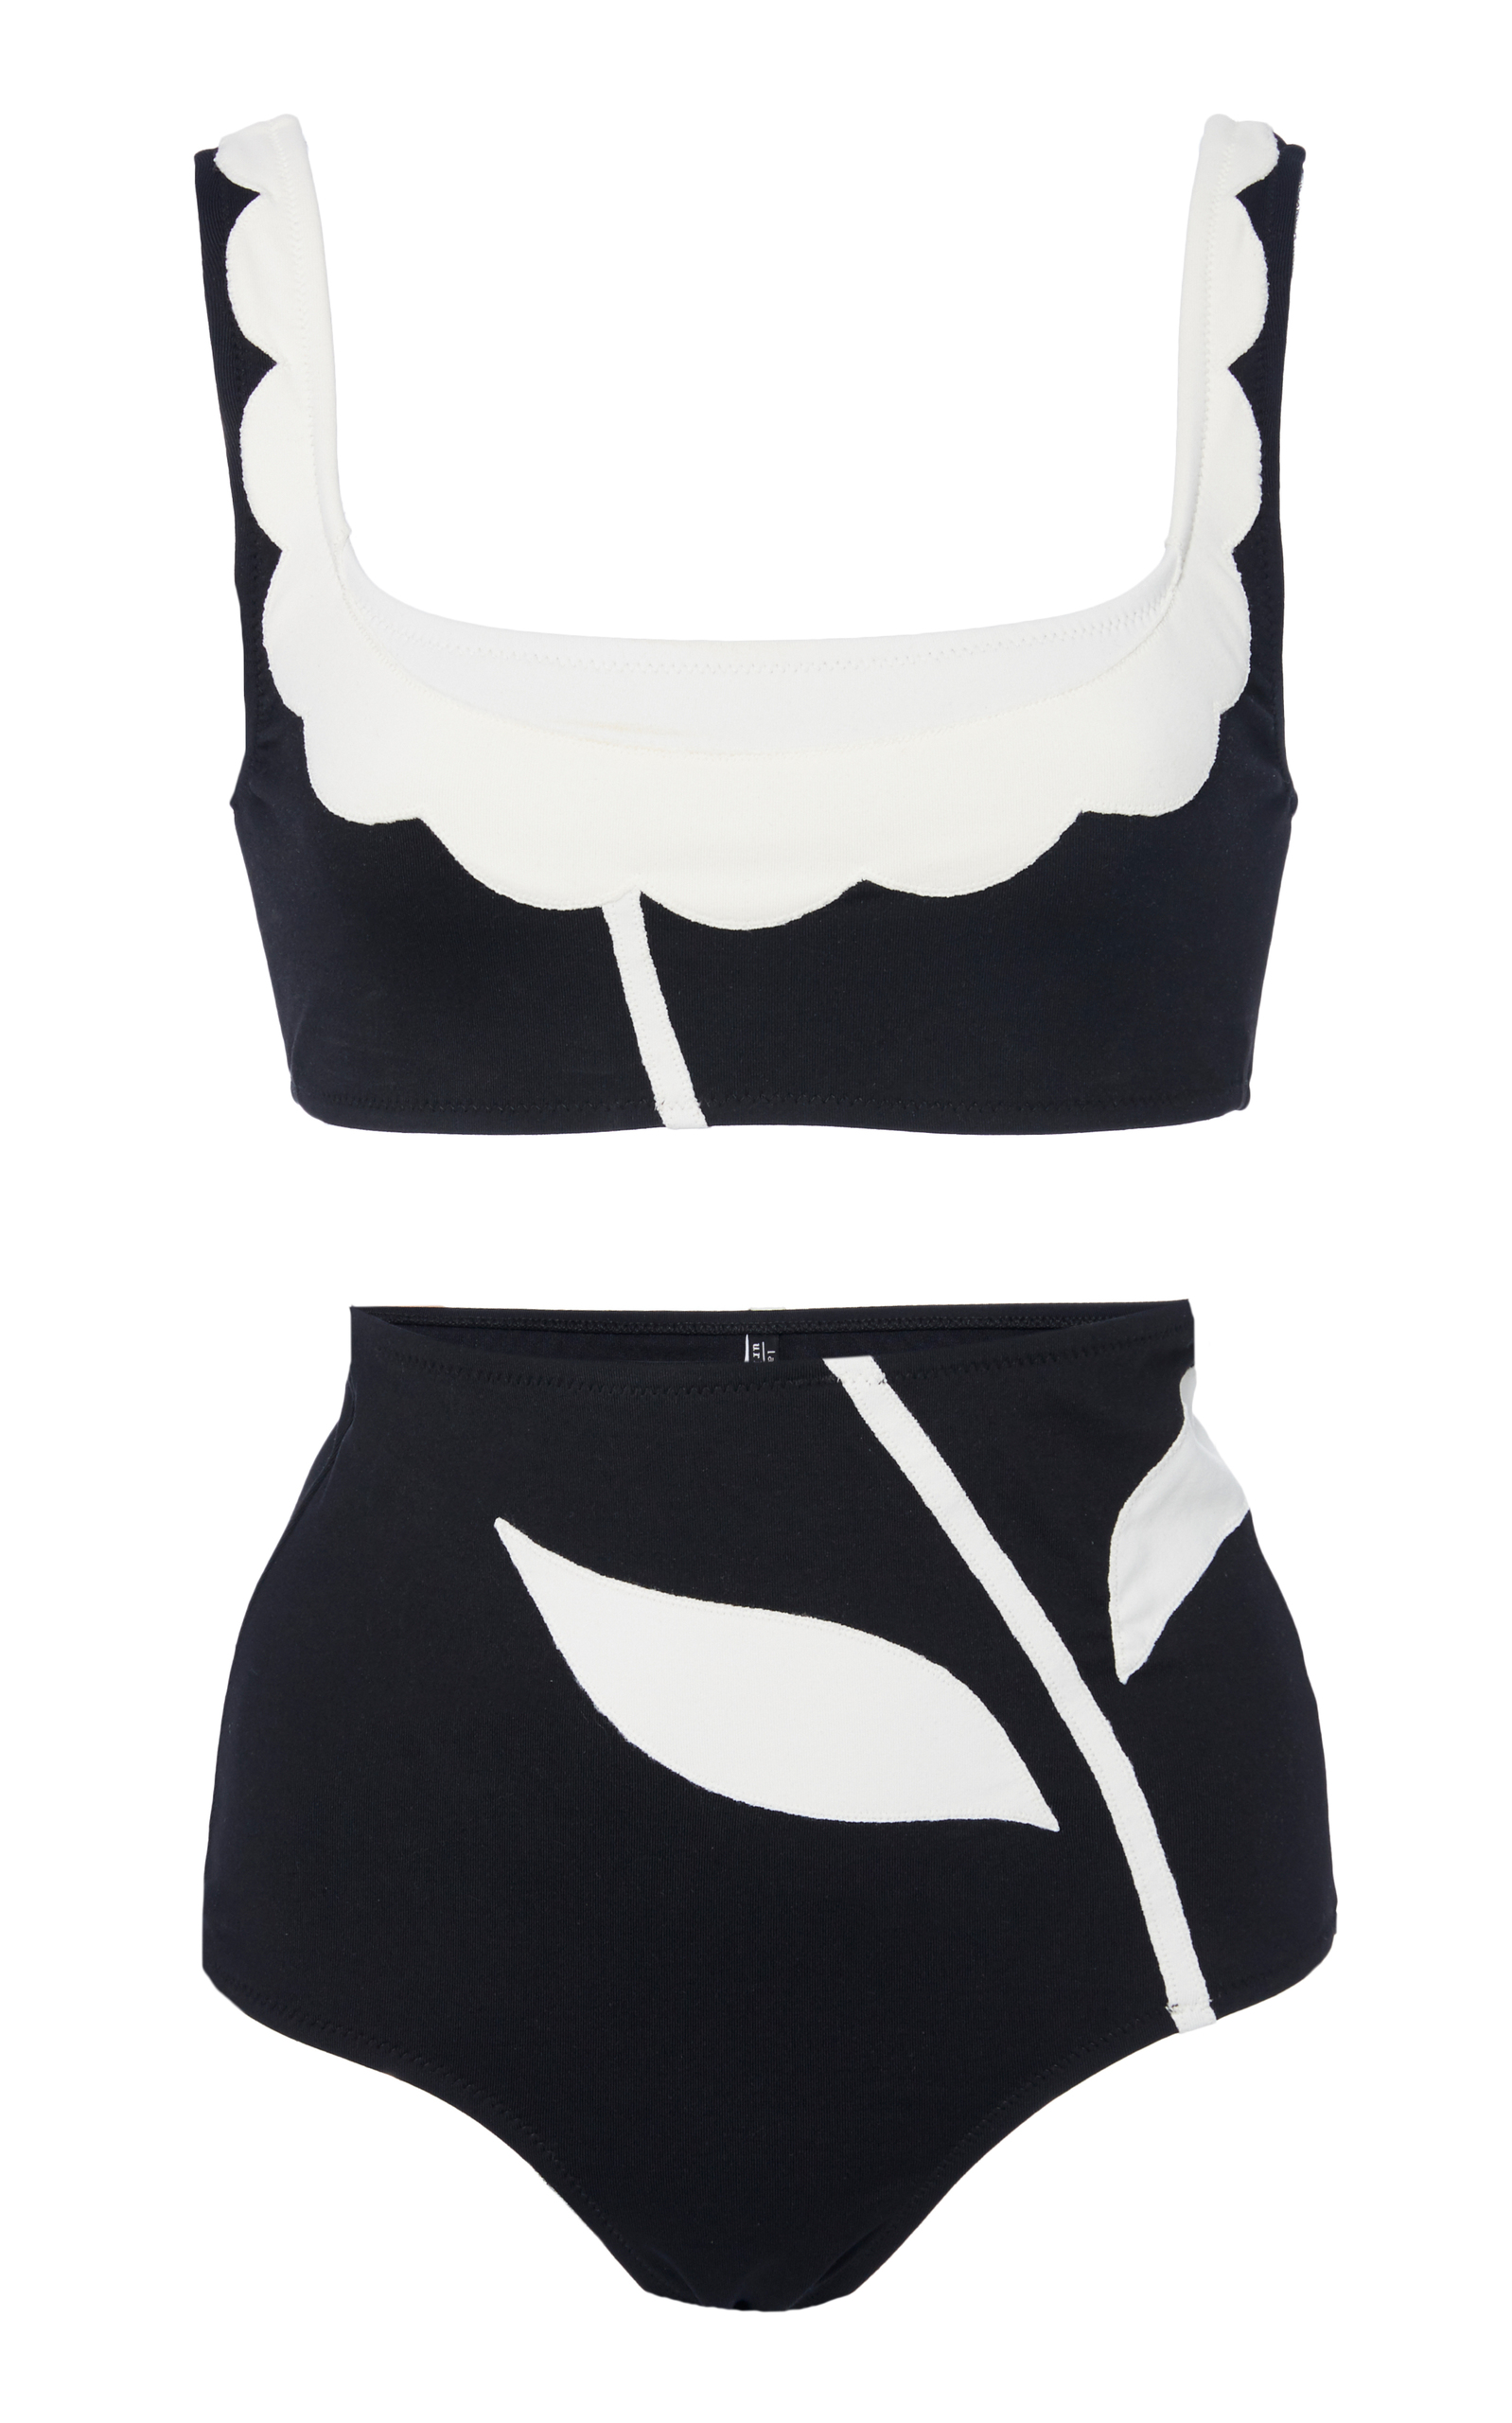 Laura Urbinati Black bikini Réduction Avec Paypal rI9K8EEz